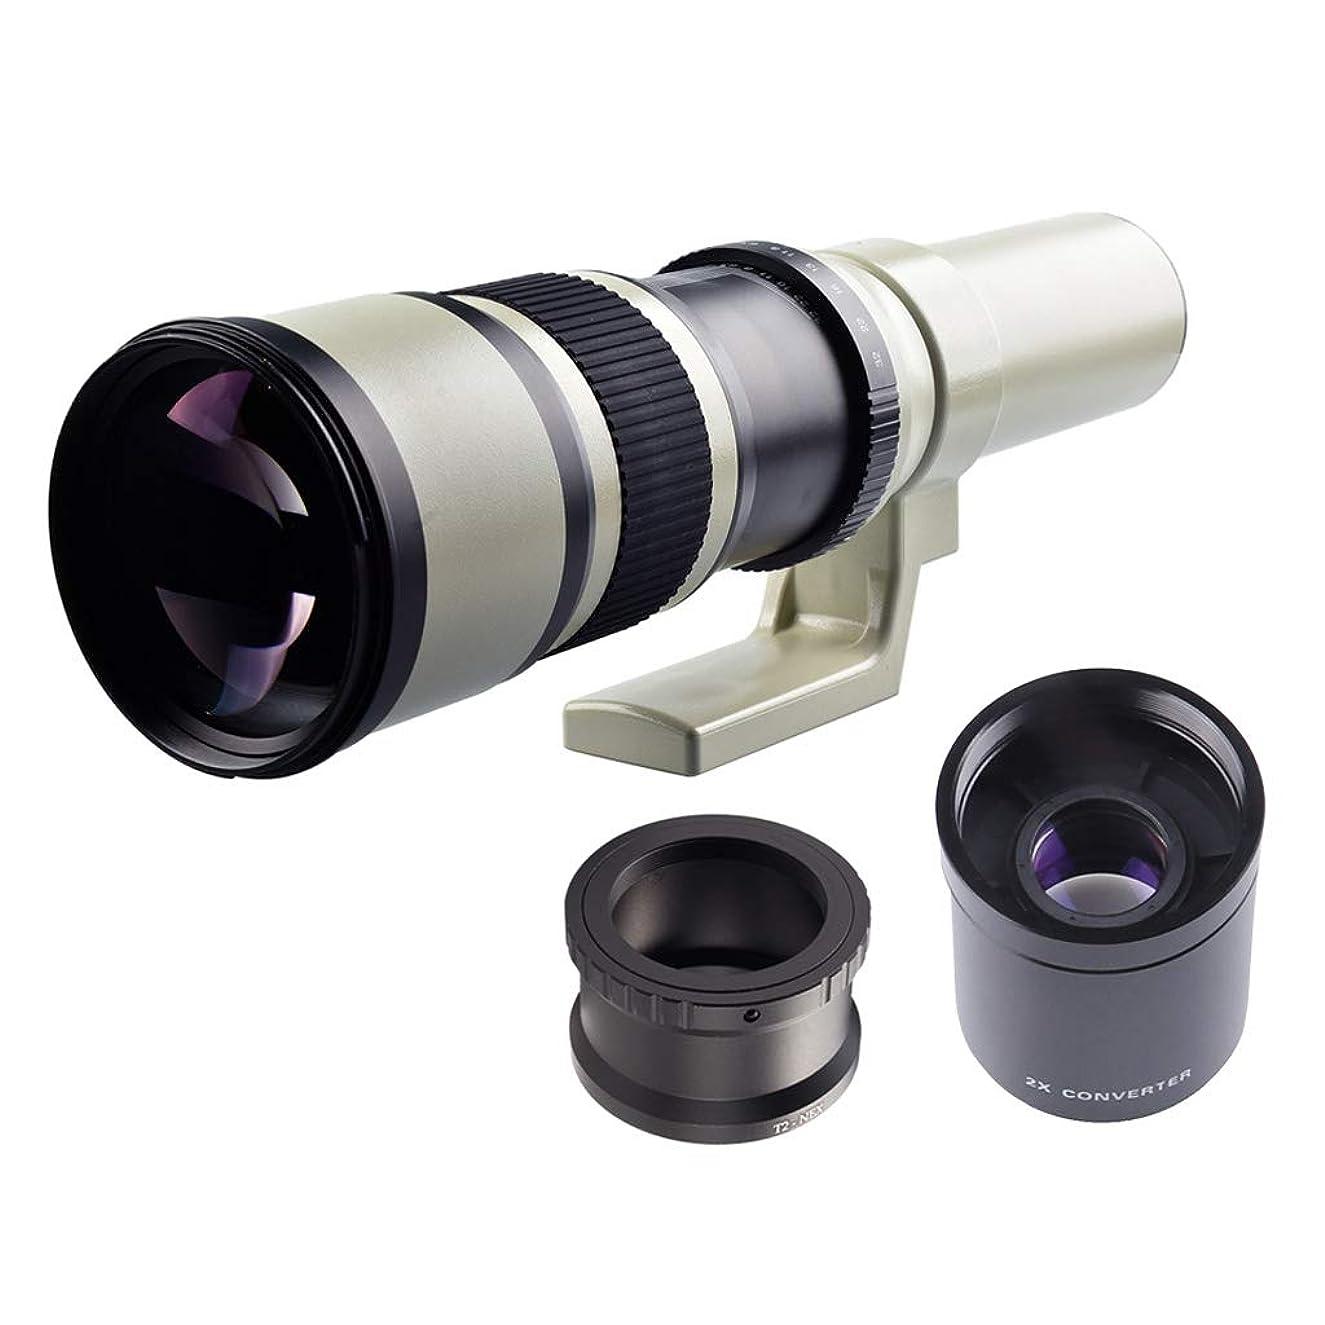 SM SunniMix 500mm f/6.3 Telephoto Lens for Sony Alpha E-Mount a9, a7r, a7s, a7, a6500, a6300, a6000, a5100, a5000, NEX-7, NEX-6, 5T, 5N, 5R, 3N + 2X Teleconverter